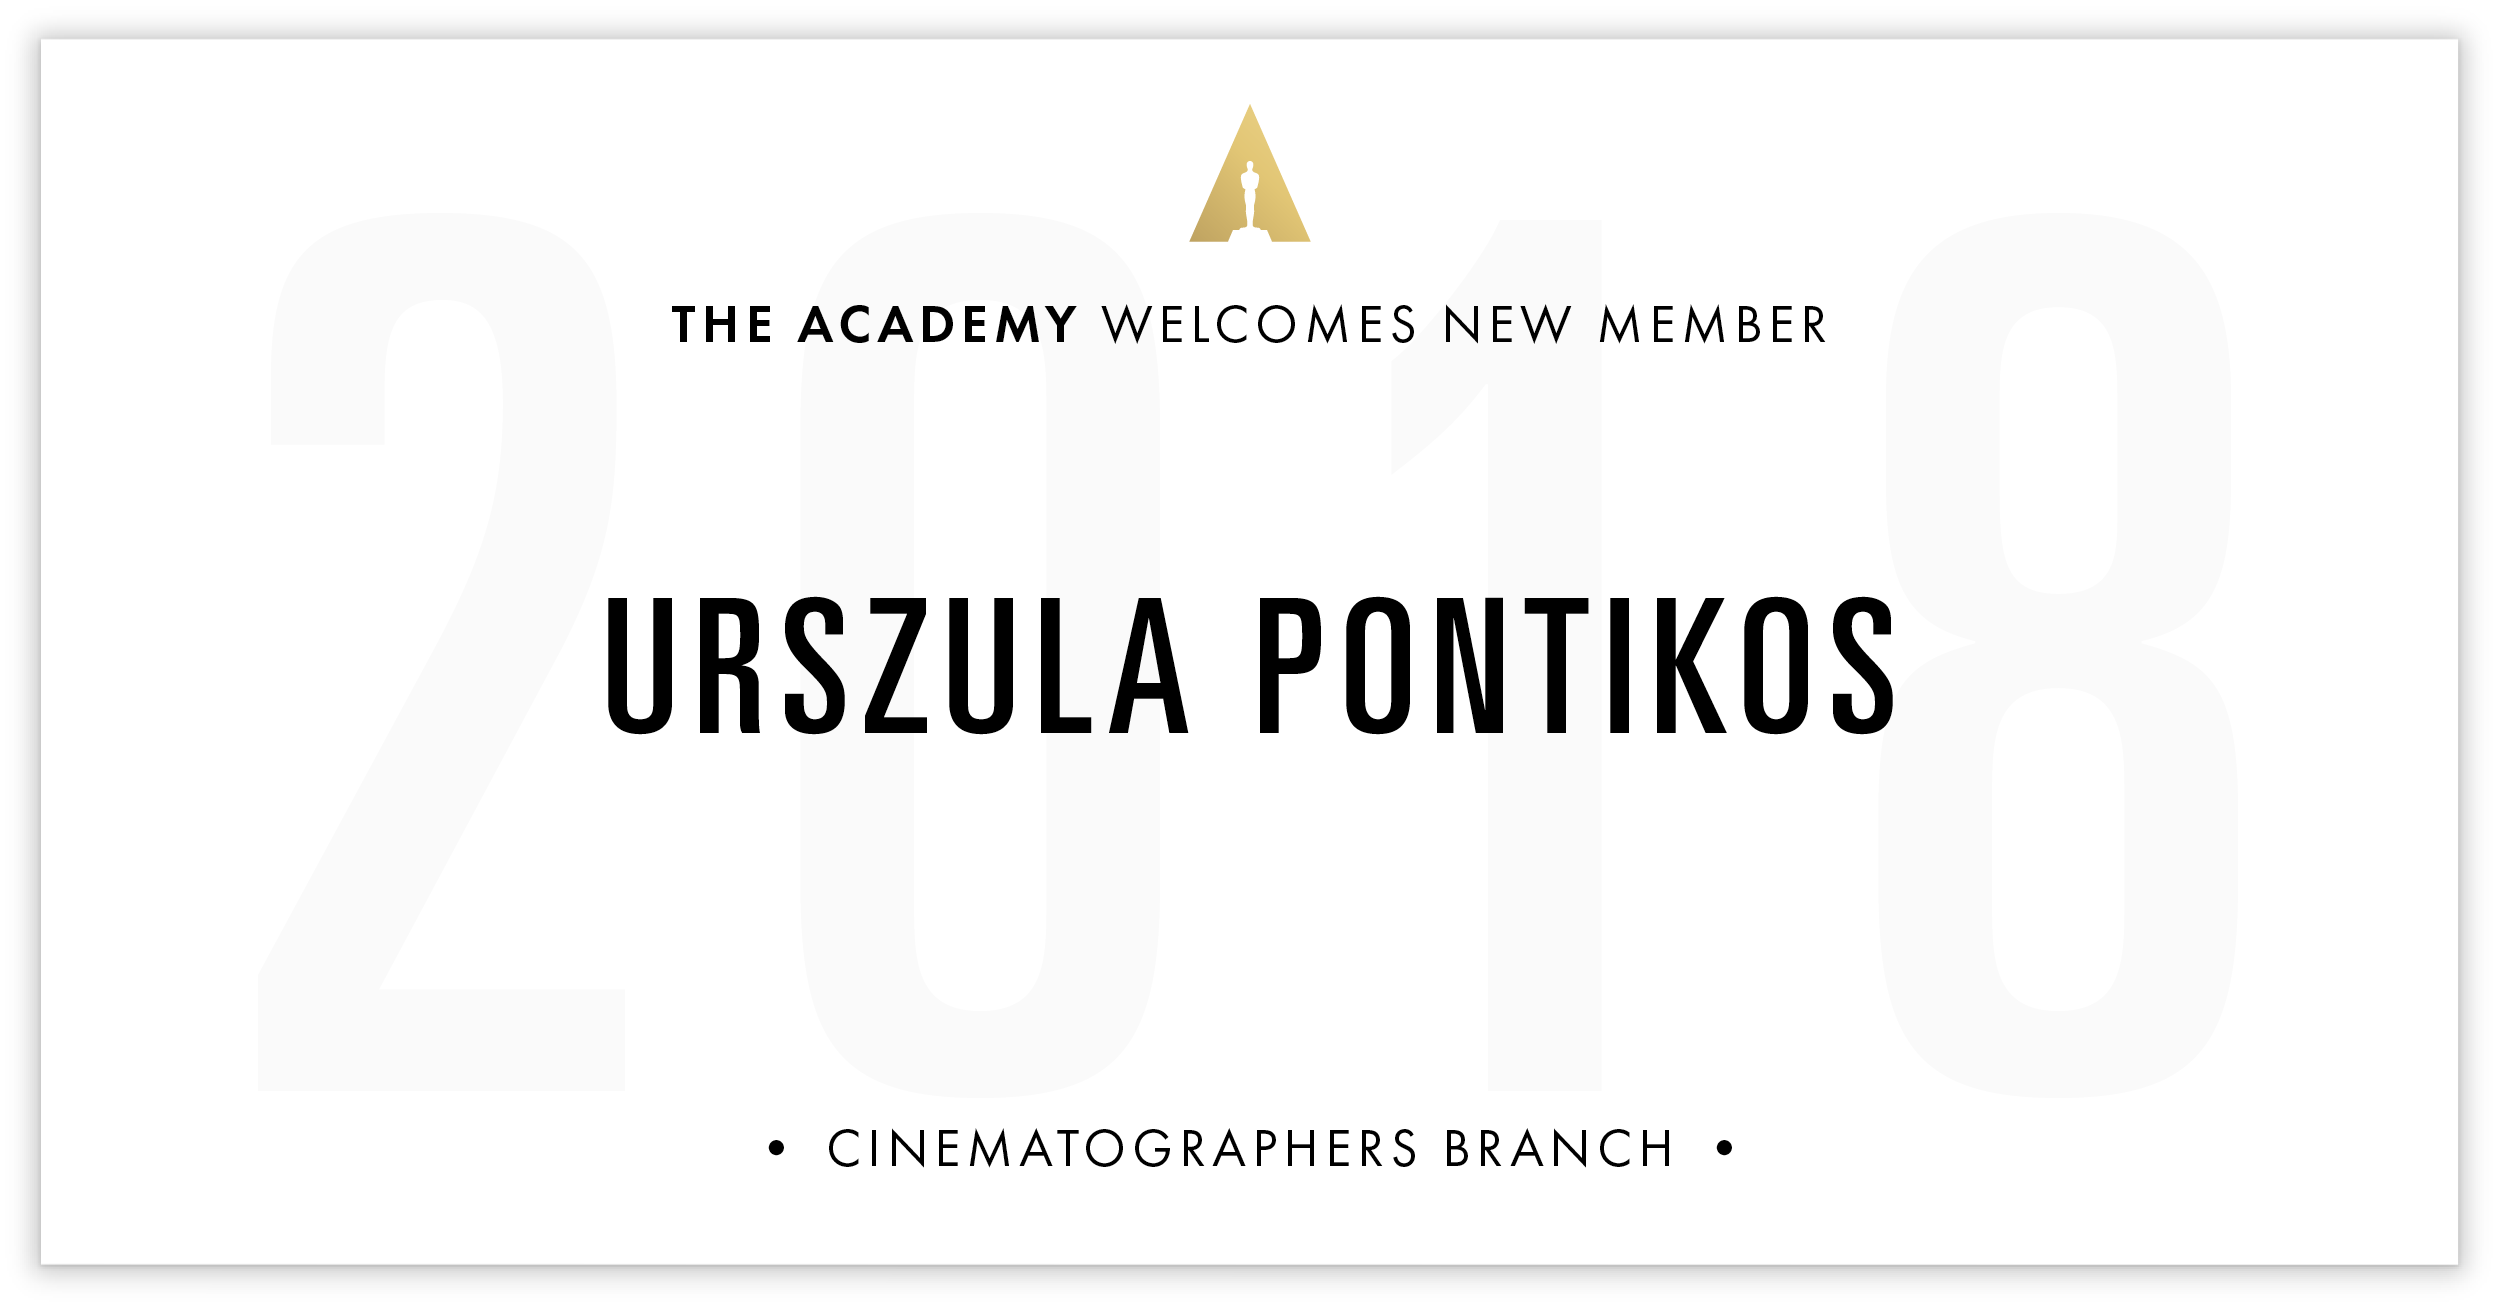 Urszula Pontikos is invited!